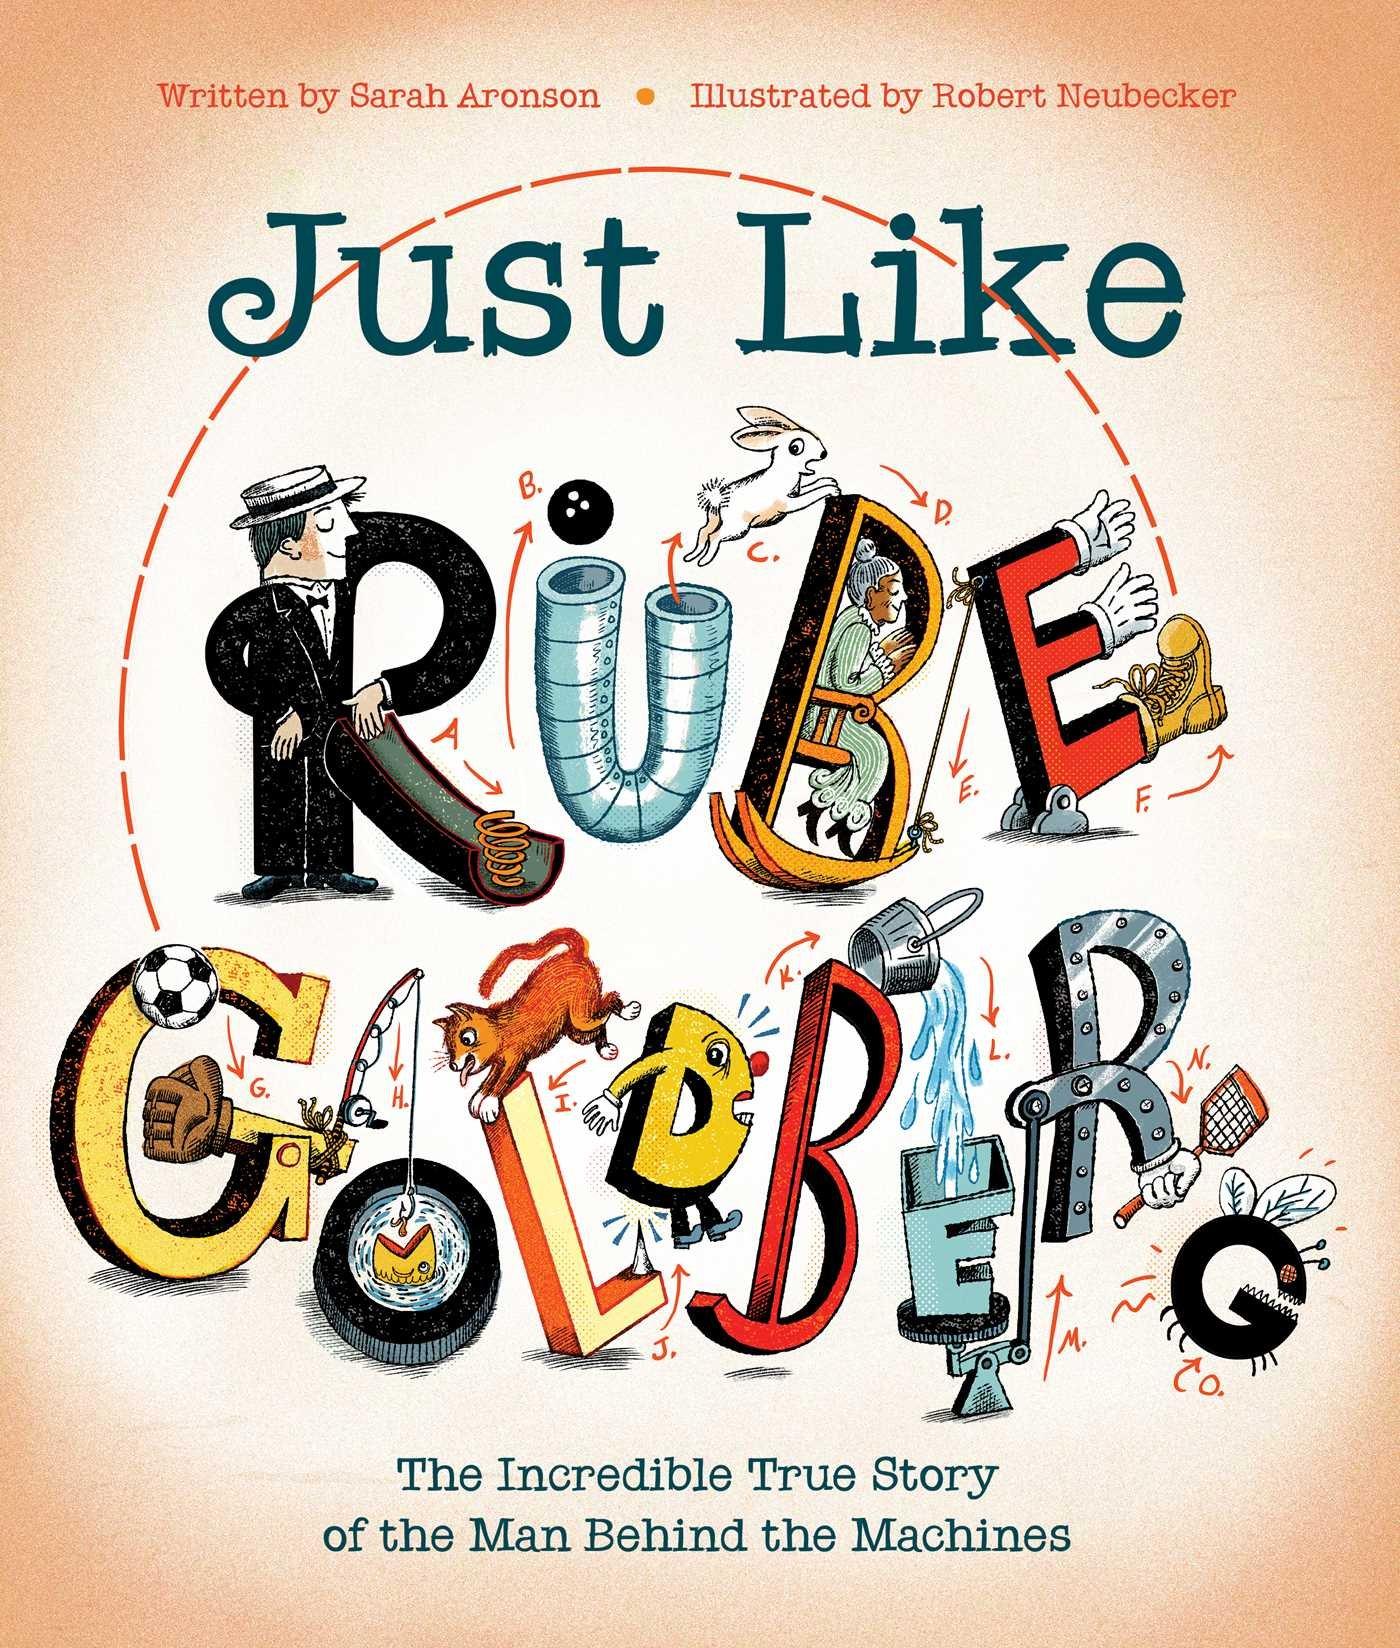 celebrate-picture-books-picture-book-review-just-like-rube-goldberg-cover